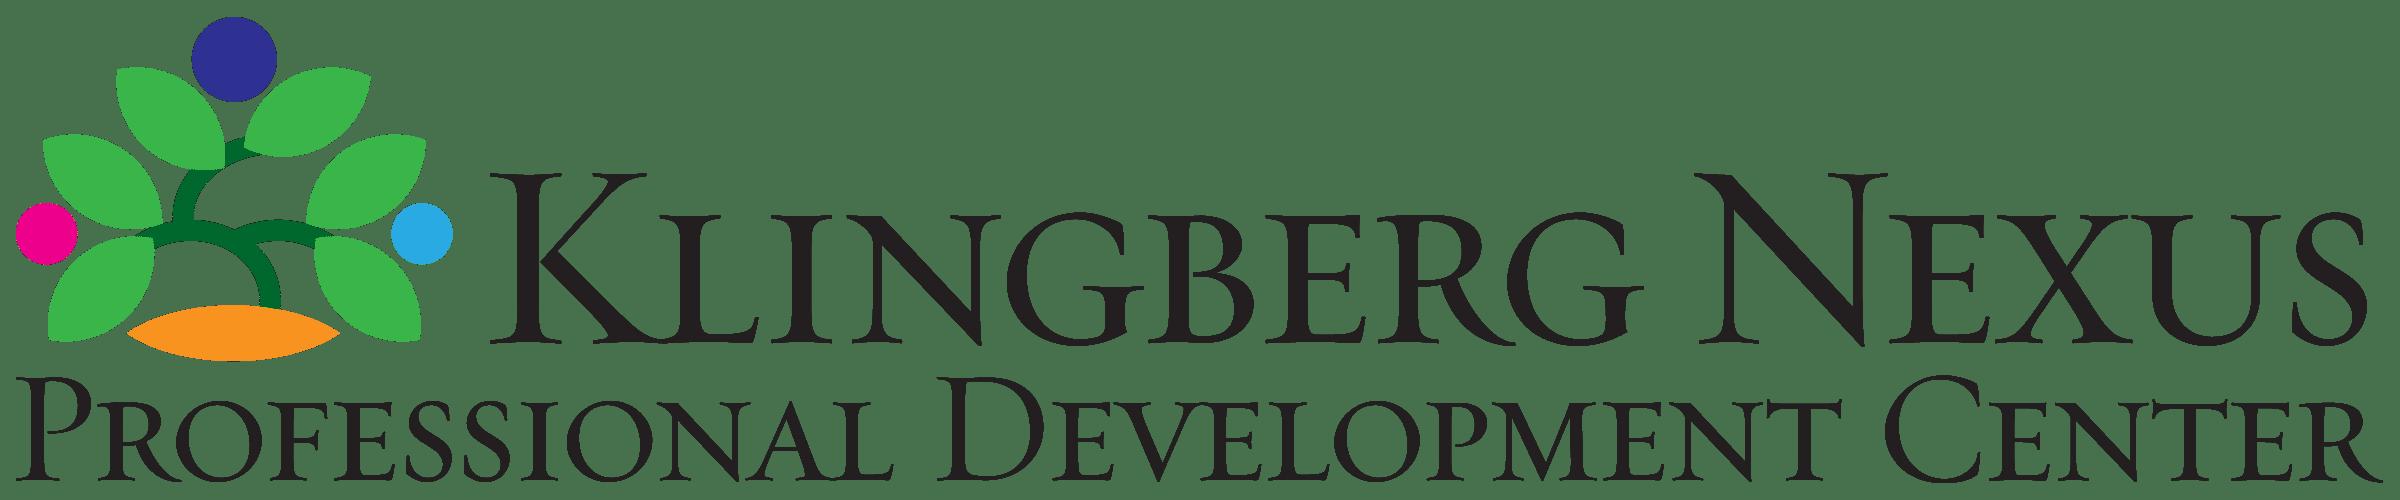 Klingberg Nexus